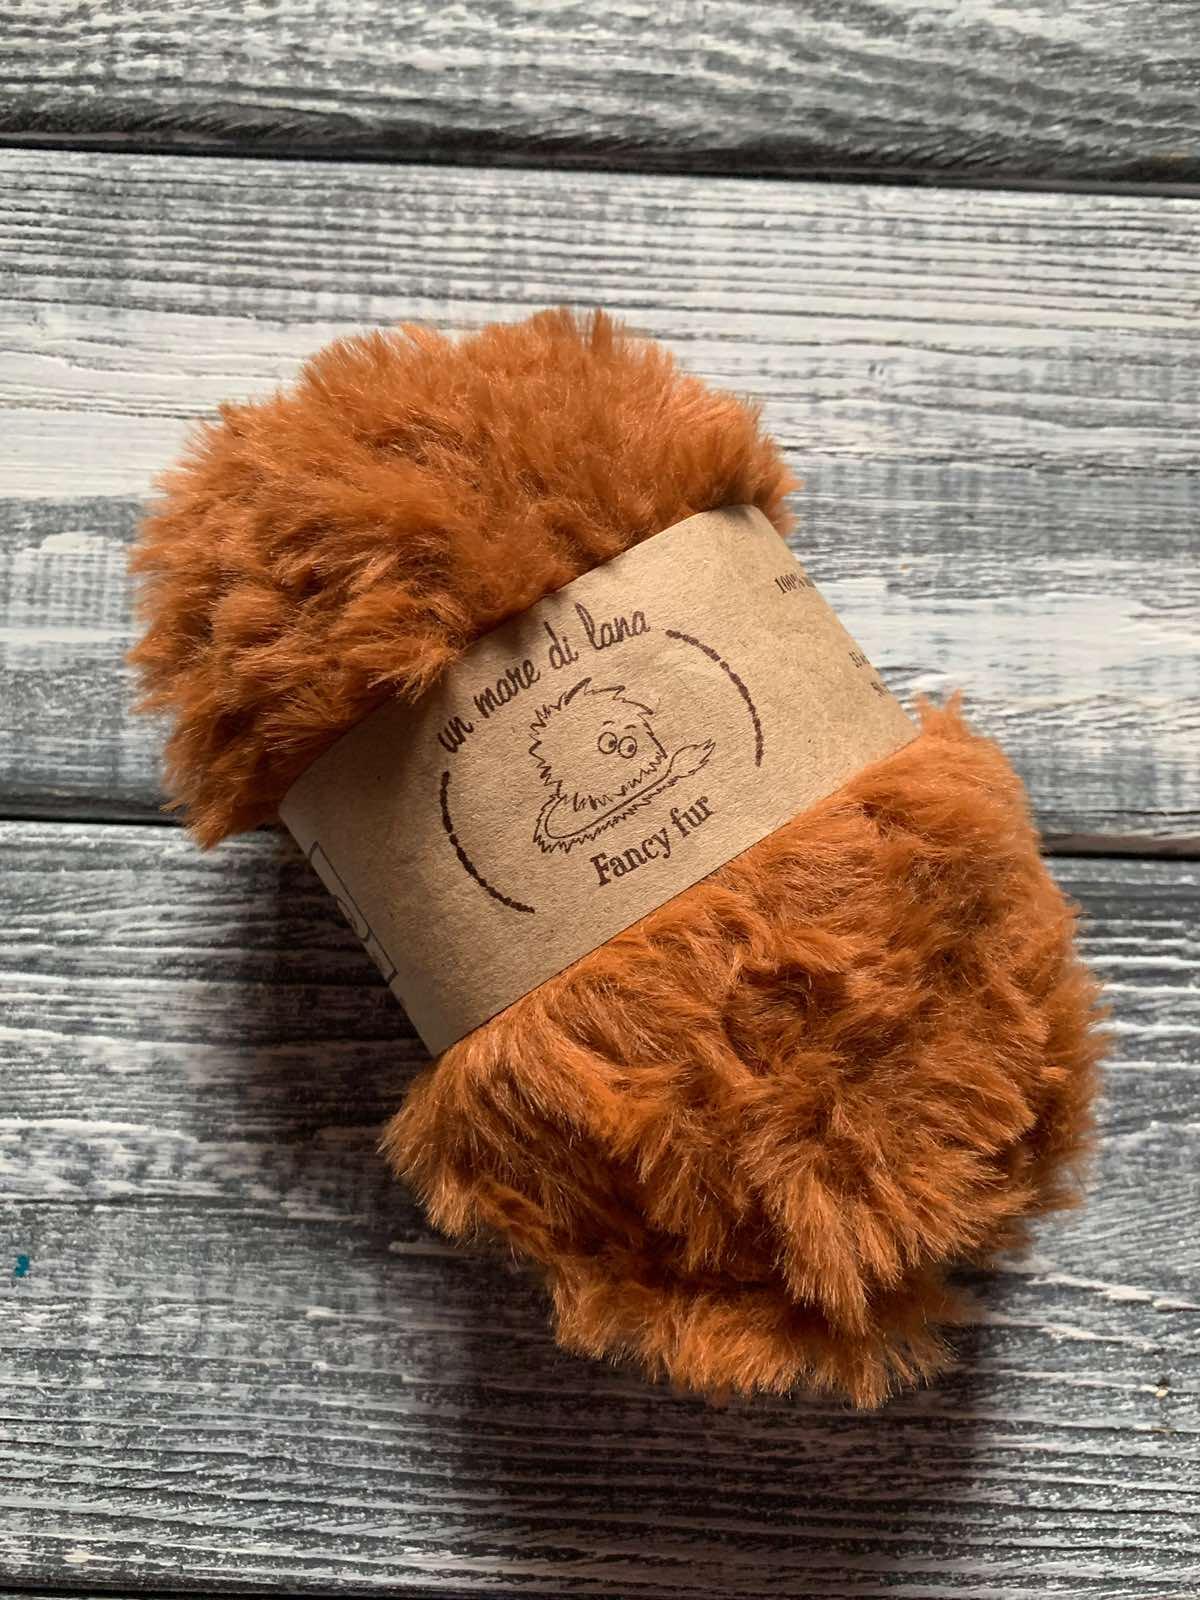 Wool Sea Fancy fur (Море шерсти Фанси фе ) 296 - рыжик заказать в Беларуси со скидкой